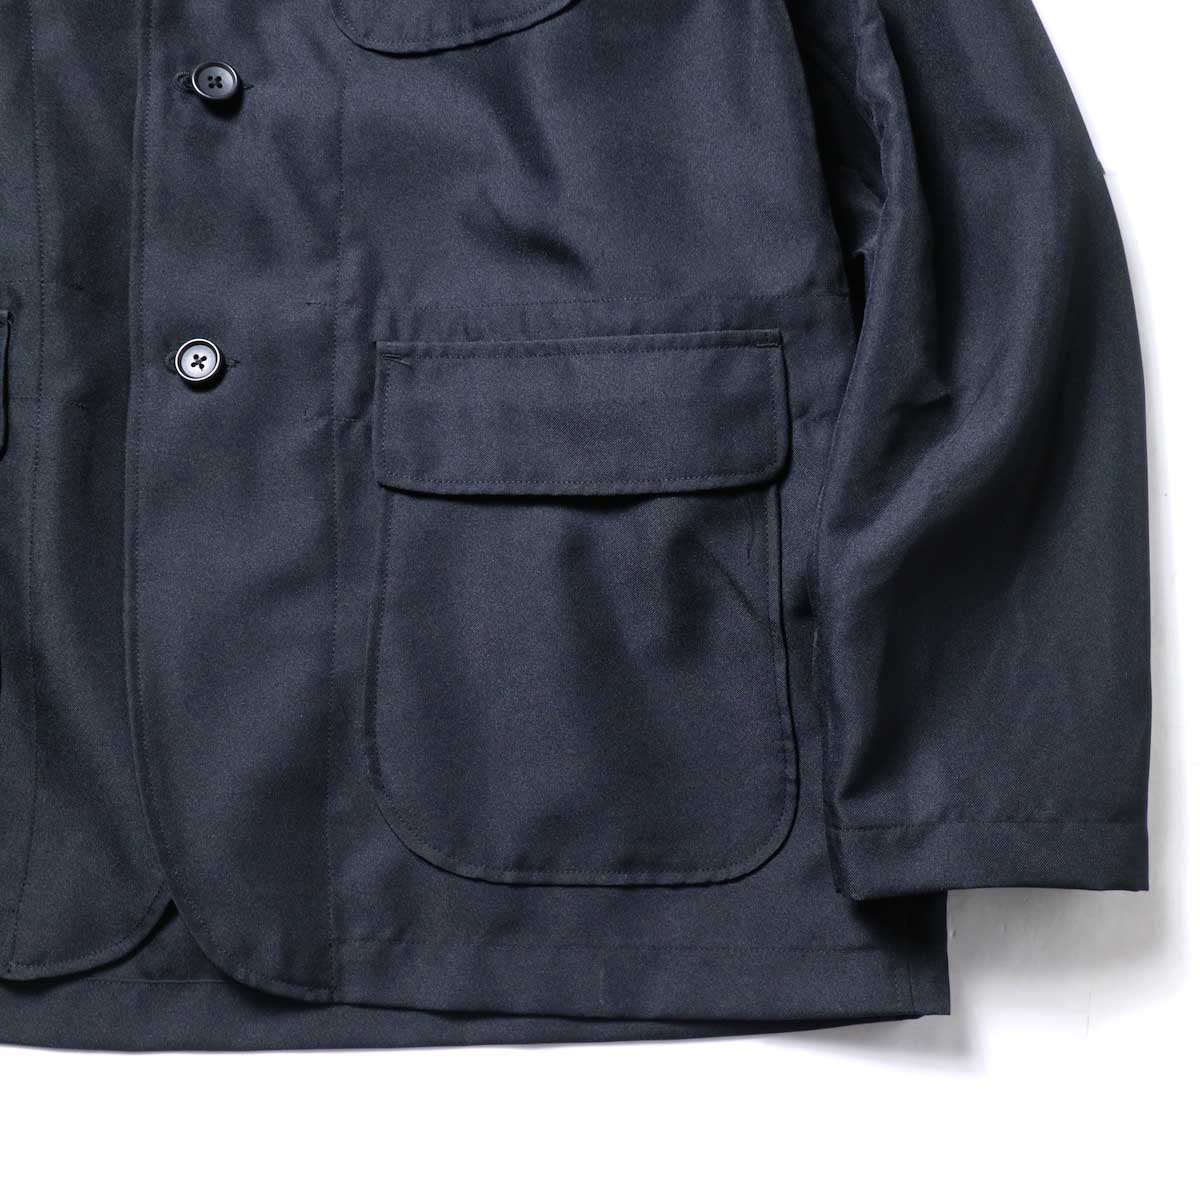 Engineered Garments / Loiter Jacket -Polyester Twill (Black)フラップポケット